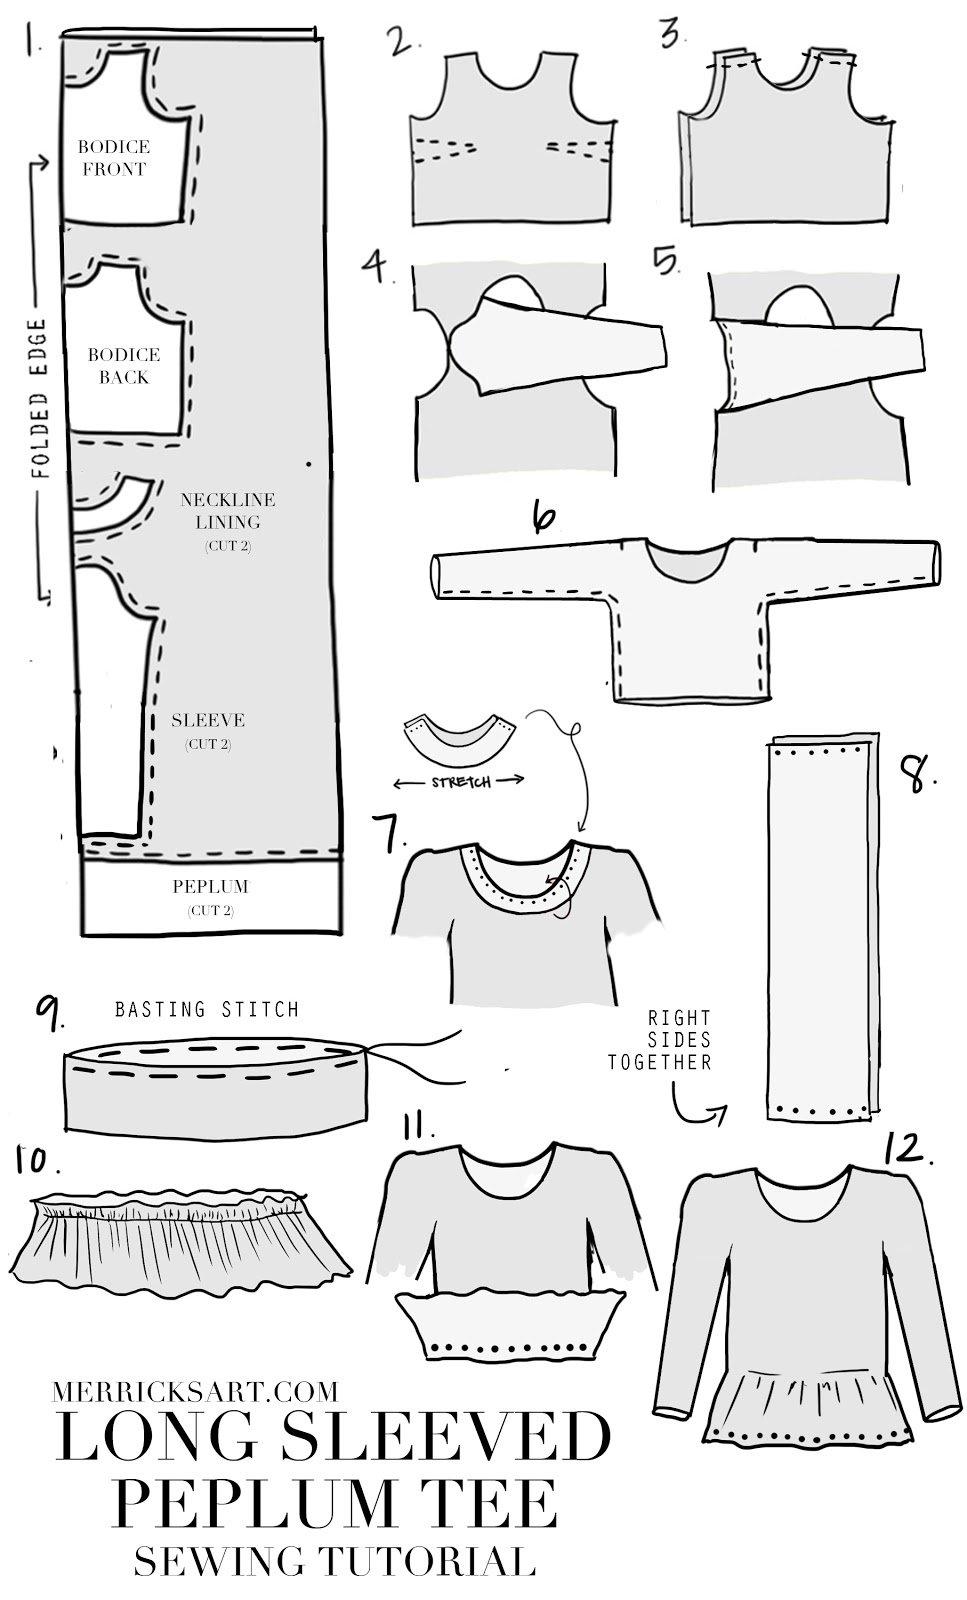 striped-long-sleeved-peplum